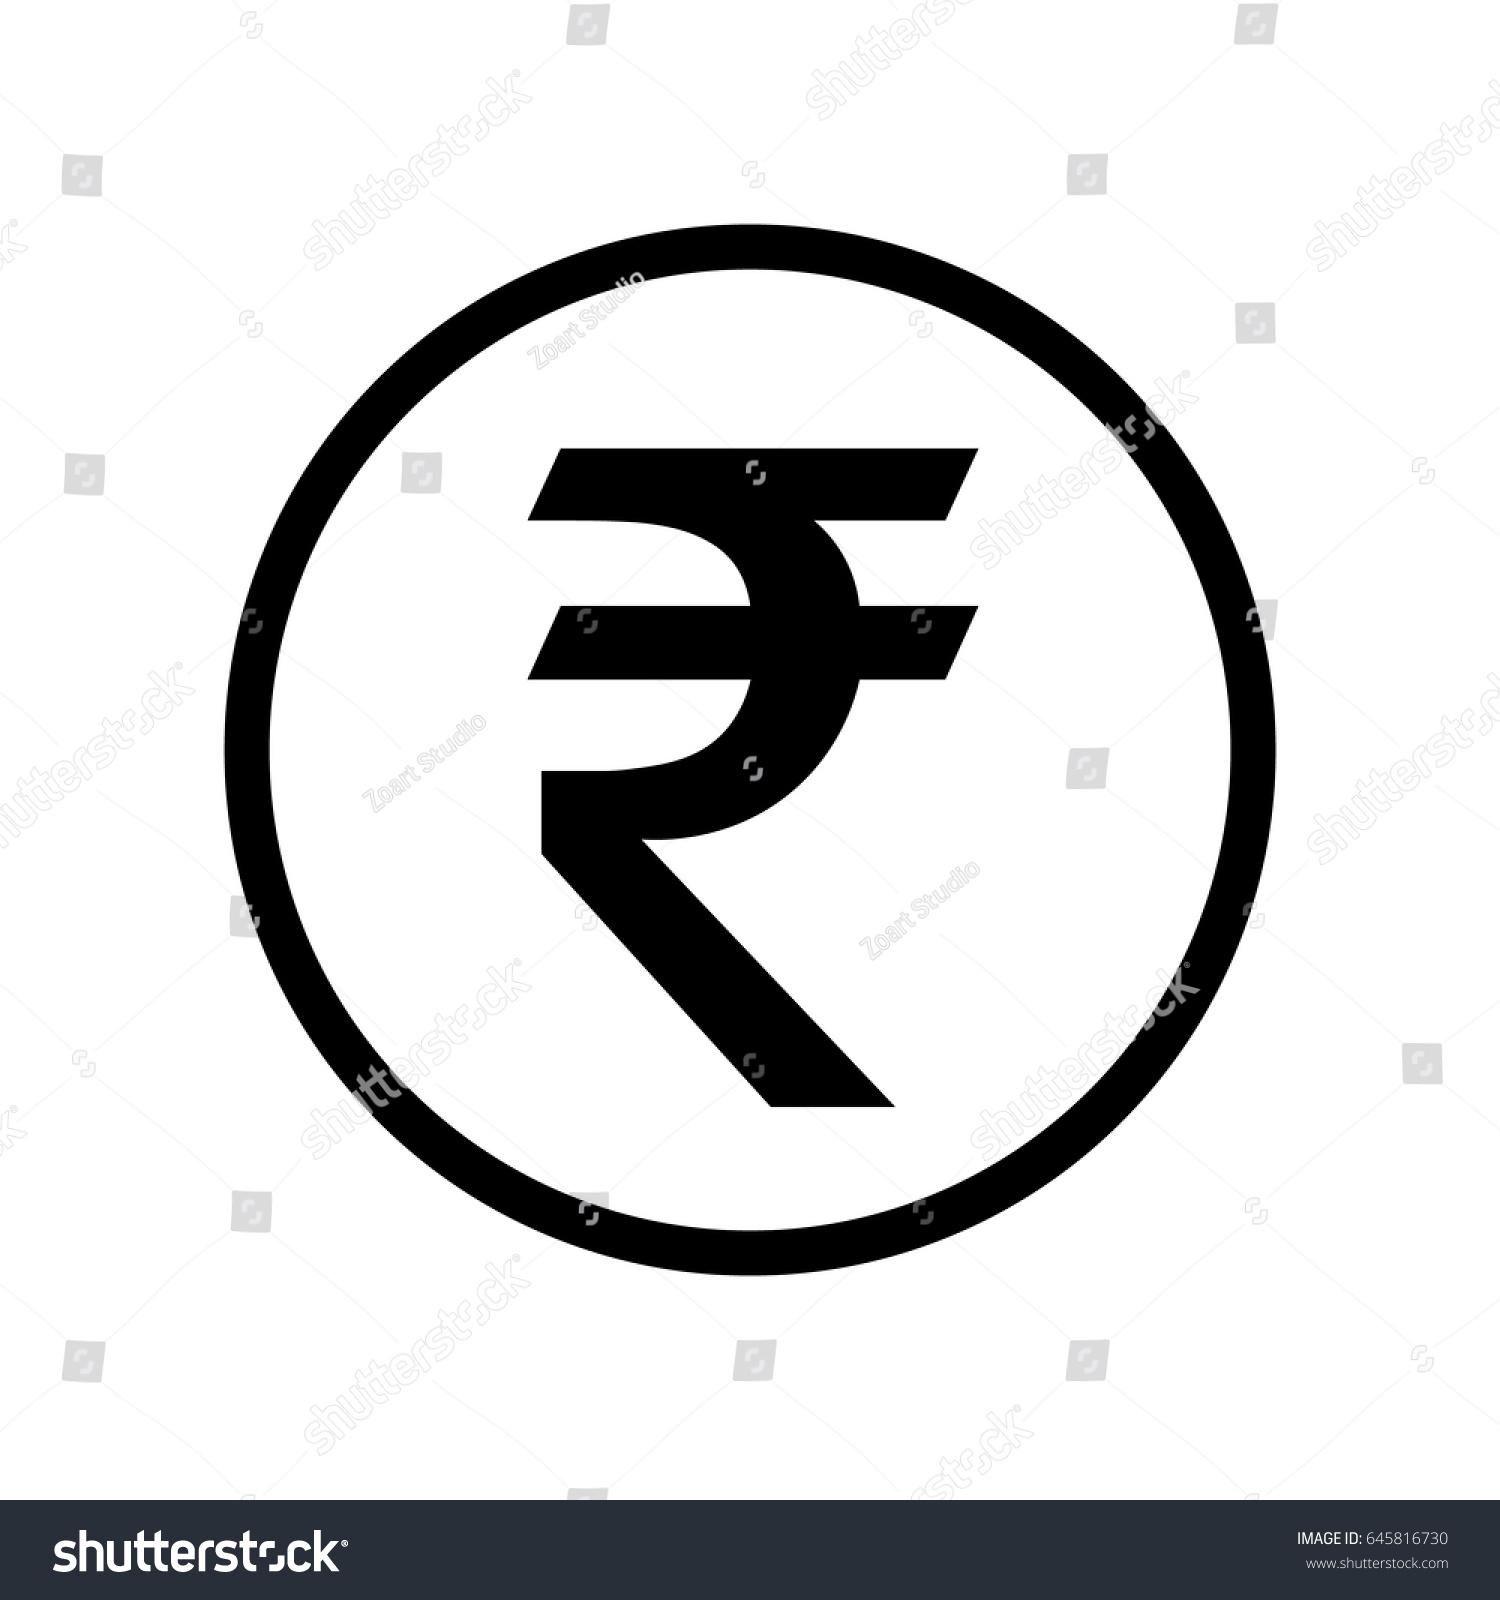 Indian rupee symbol circle stock vector 645816730 shutterstock indian rupee symbol in circle biocorpaavc Choice Image